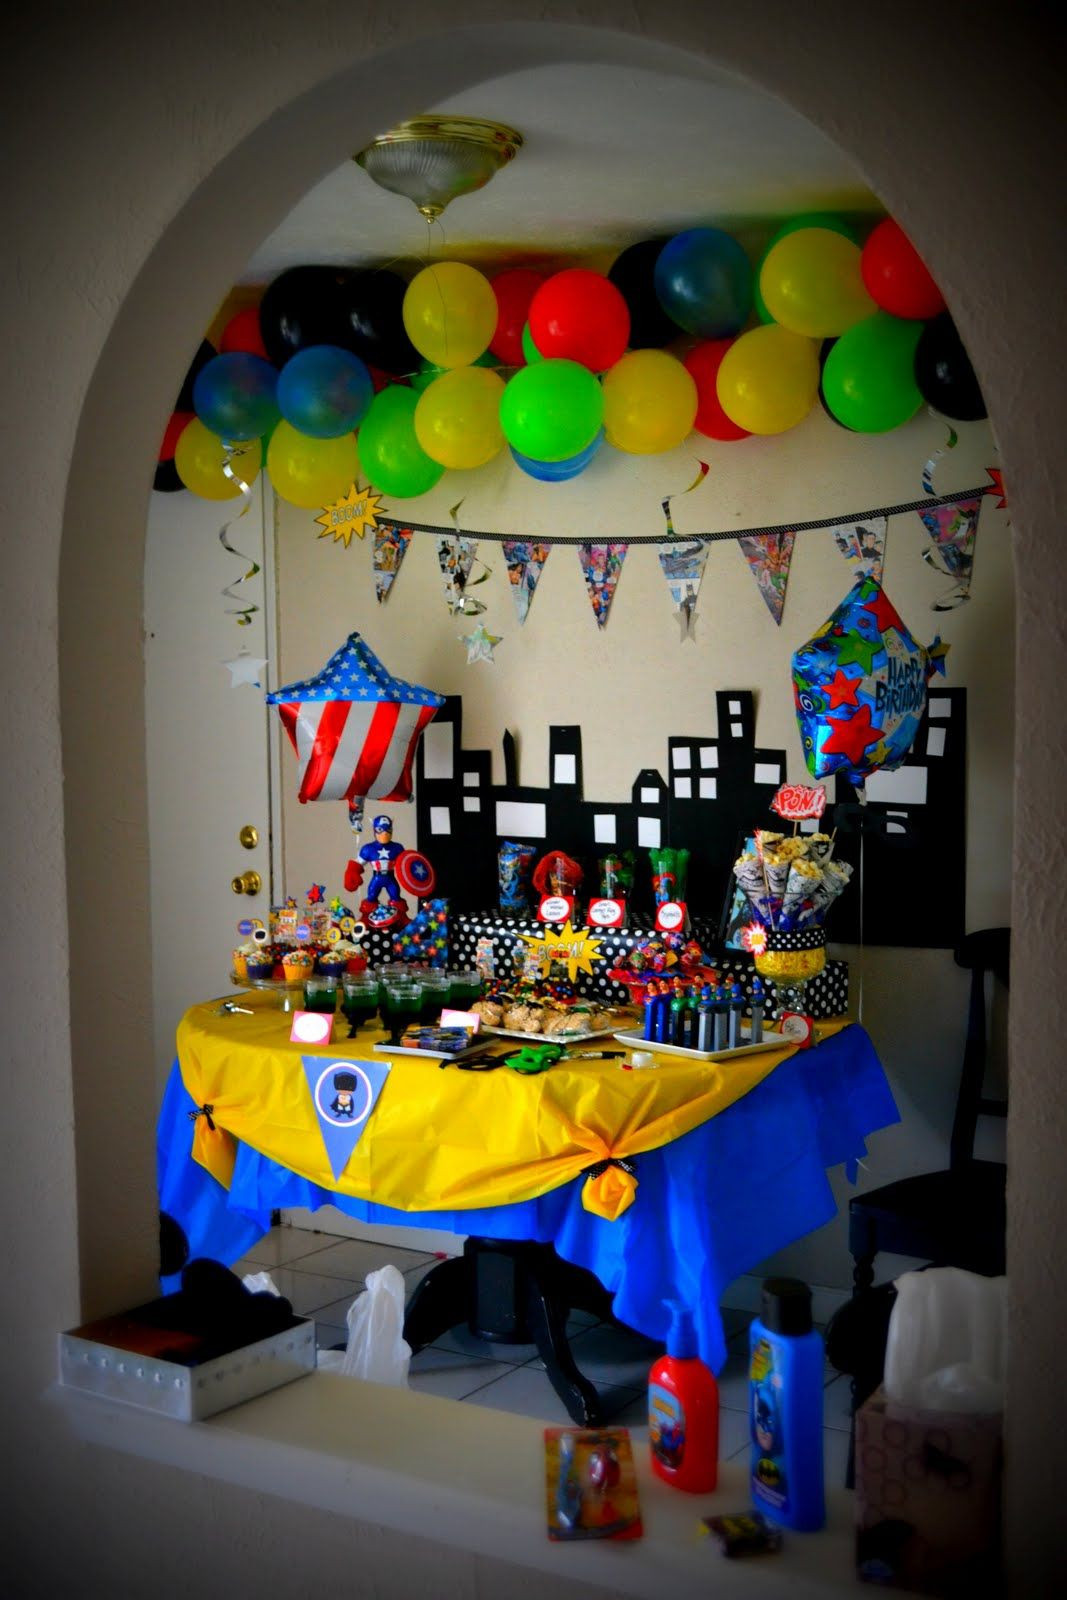 Best ideas about Superhero Birthday Decorations . Save or Pin Superhero party Birthday ideas Now.